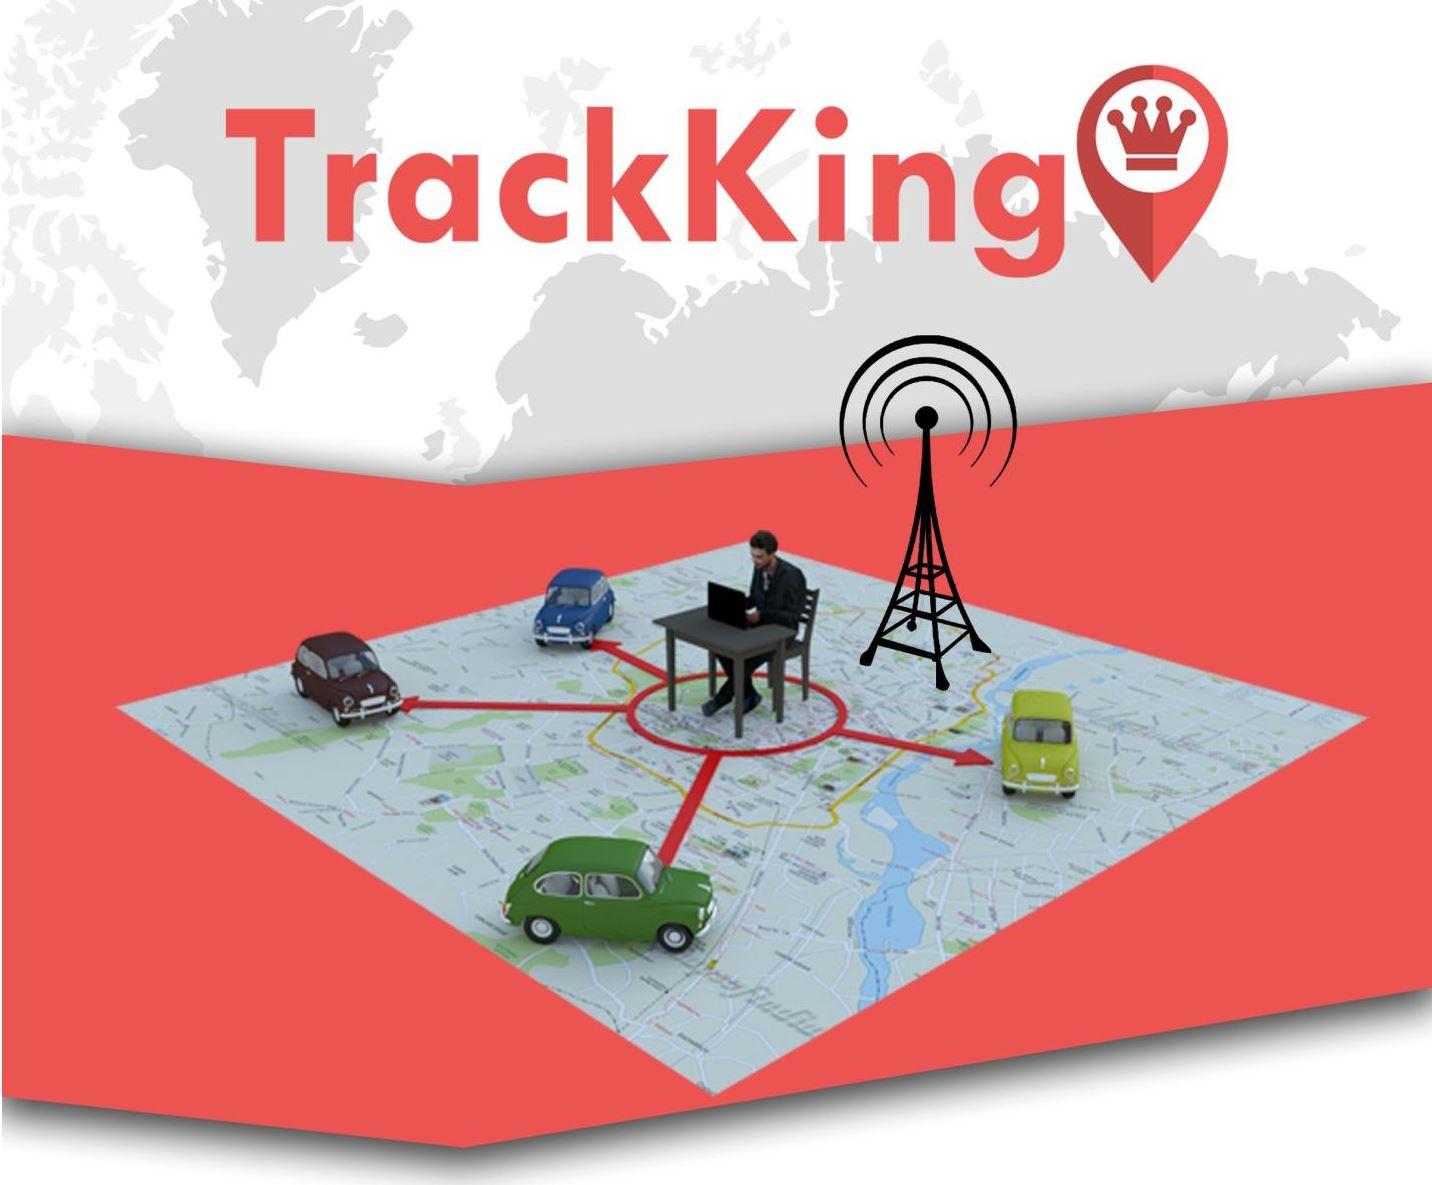 Trackking-Main